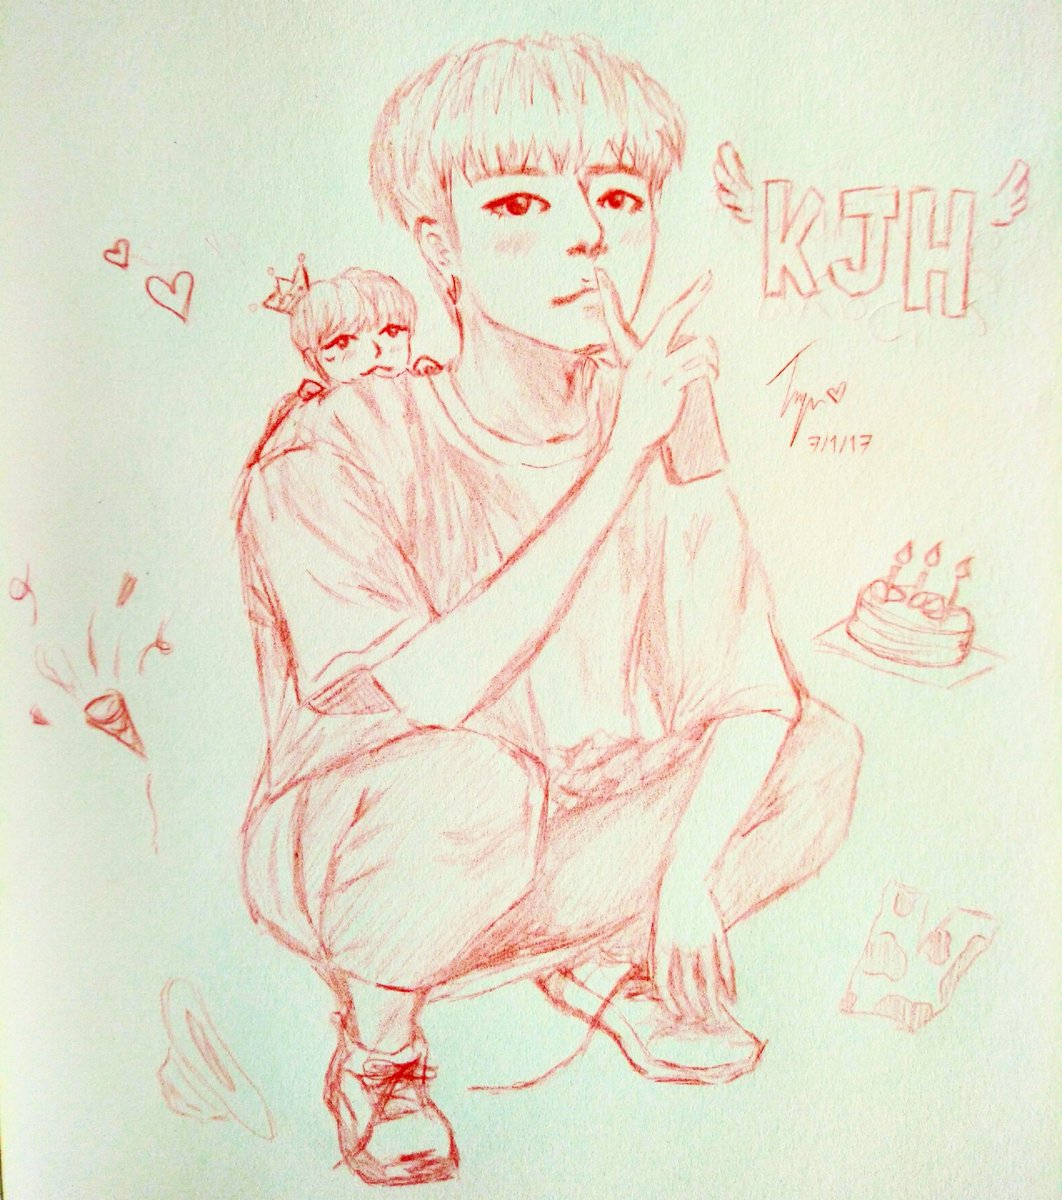 Happy Birthday Little JINNY DAY #iKON #Jinhwanderfulday #jinhwan #fanartikon #Junhoe #withikonic #junhwan<br>http://pic.twitter.com/CZgrcdT9YB